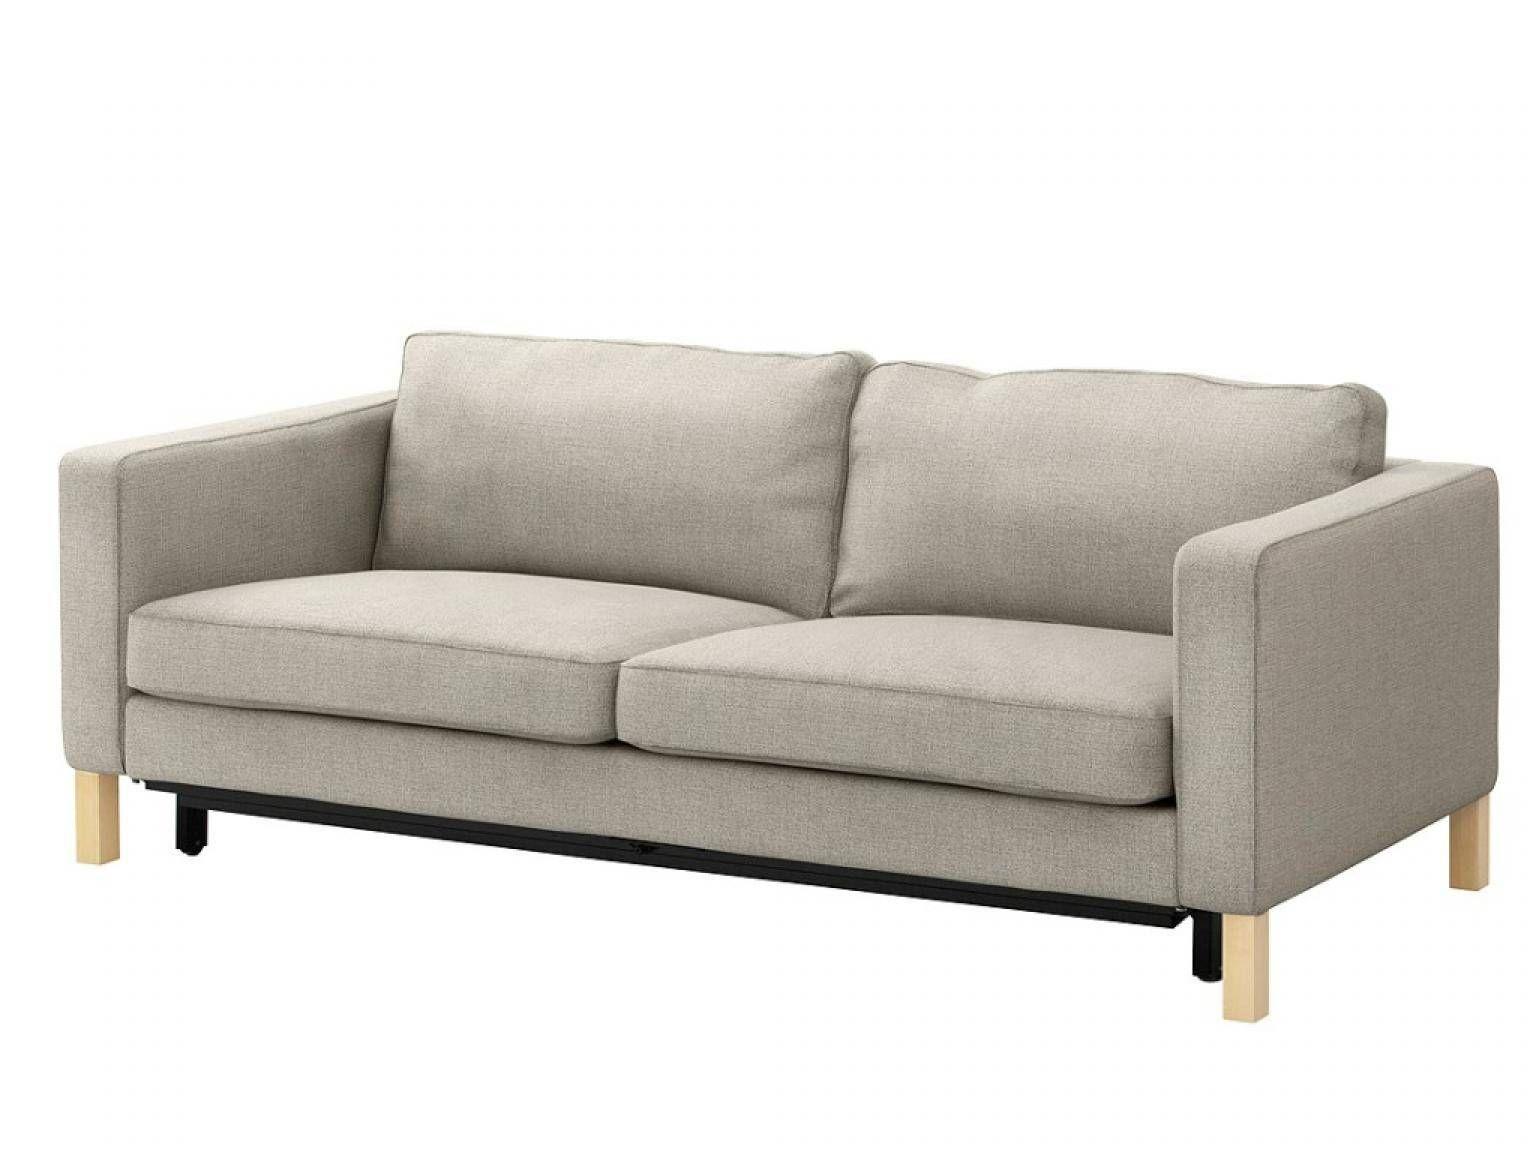 Ikea Canape Lit Convertible S Canape Lit Convertible Ikea In 2020 Ikea Sofa Sofa Bed Sofa